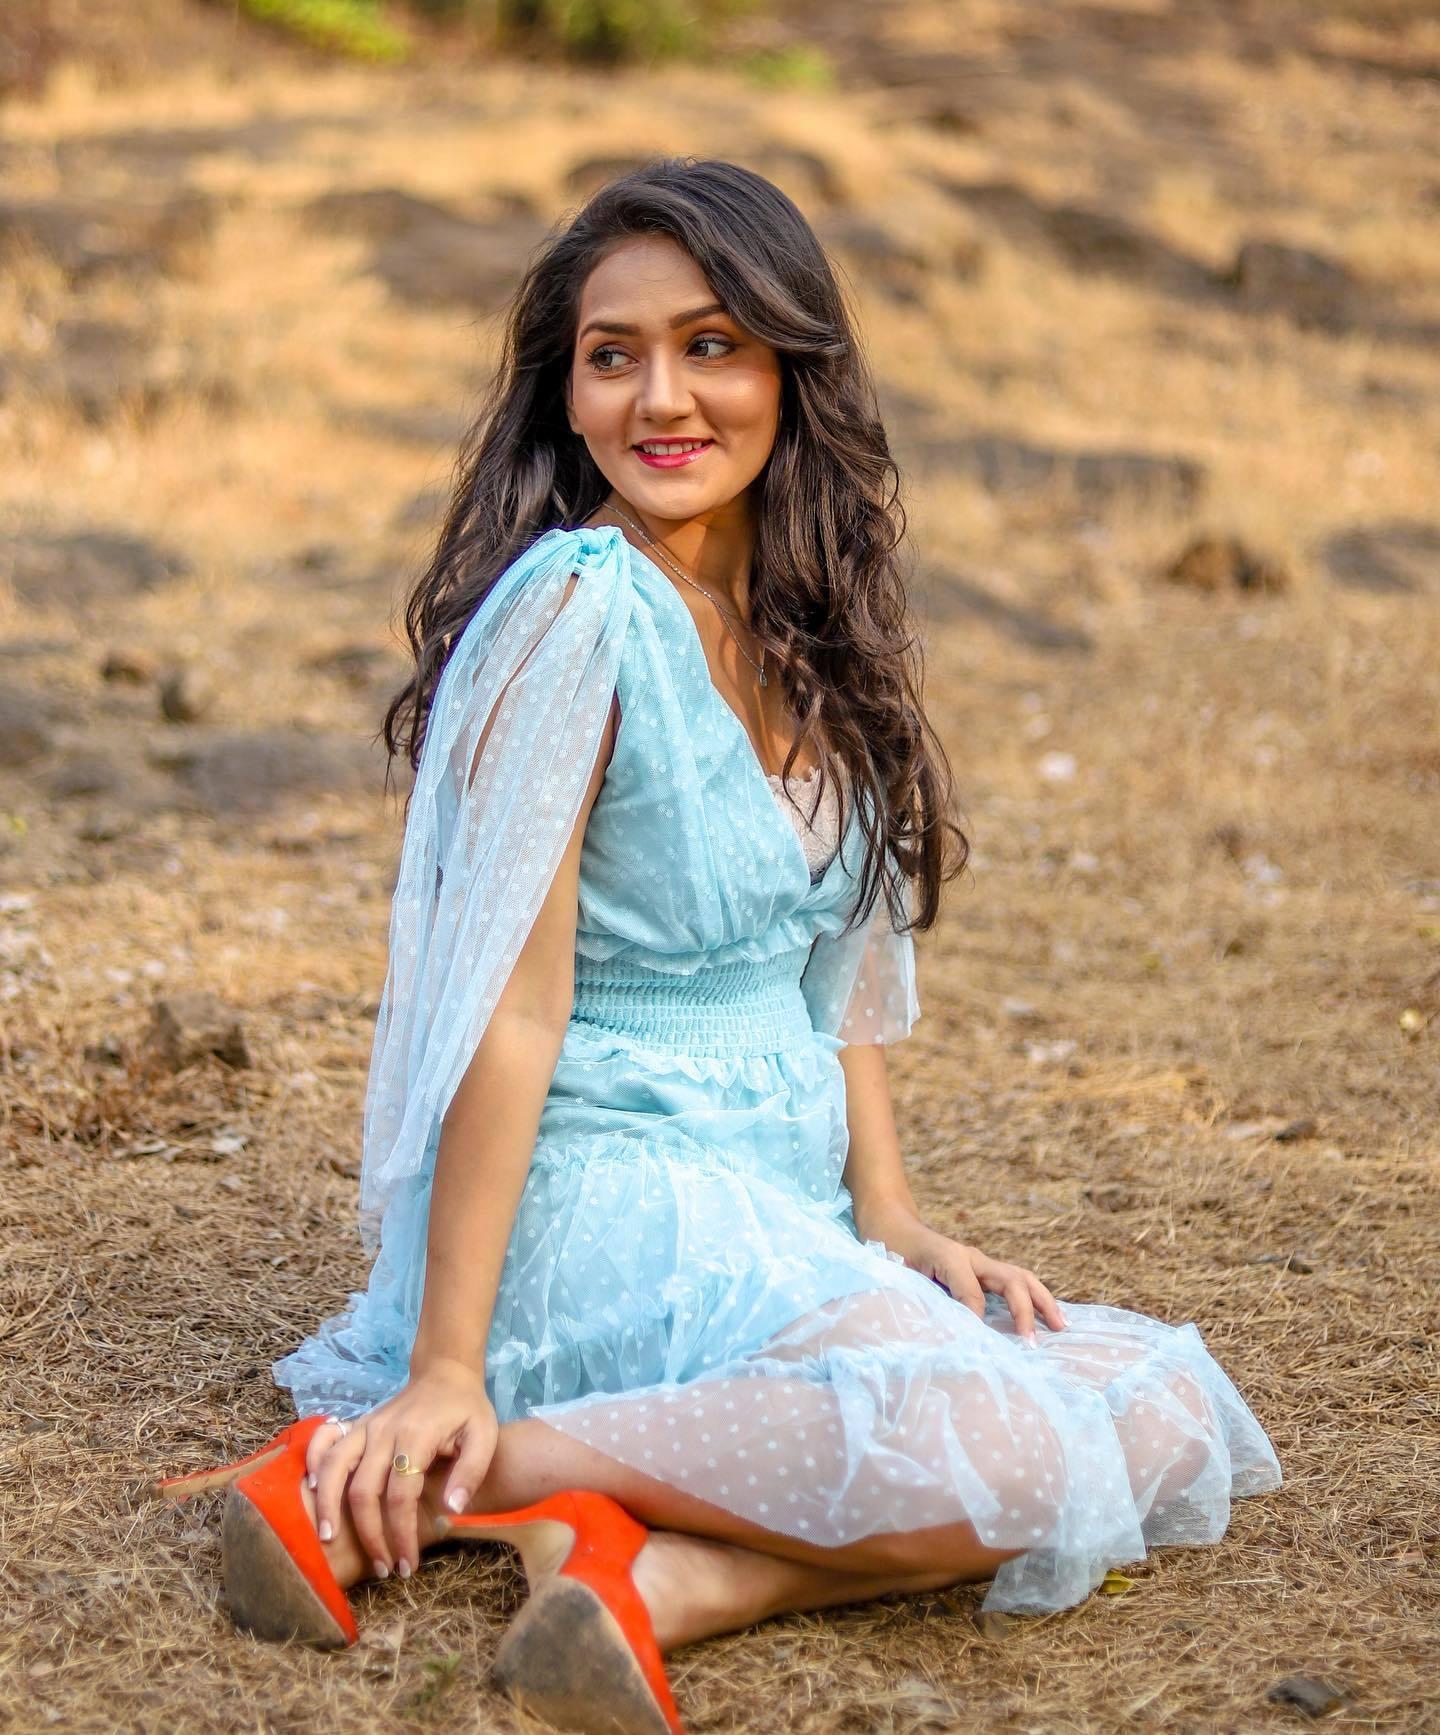 Kritika Sharma Profile| Contact Details (Phone number, Instagram, Twitter, Facebook)